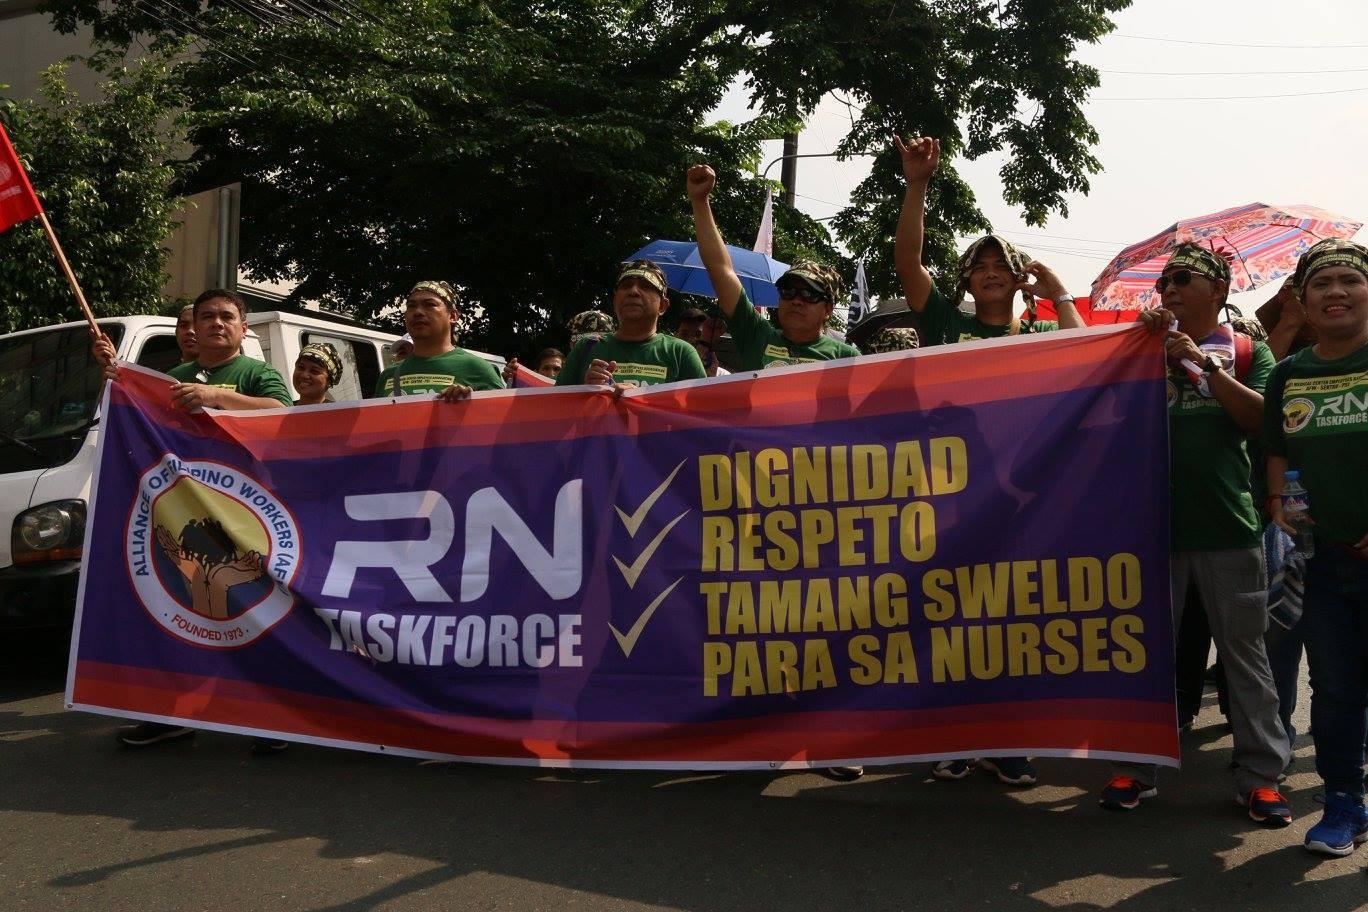 2-slogan-organising-nurses-4-main-image-3voxizlu.jpg